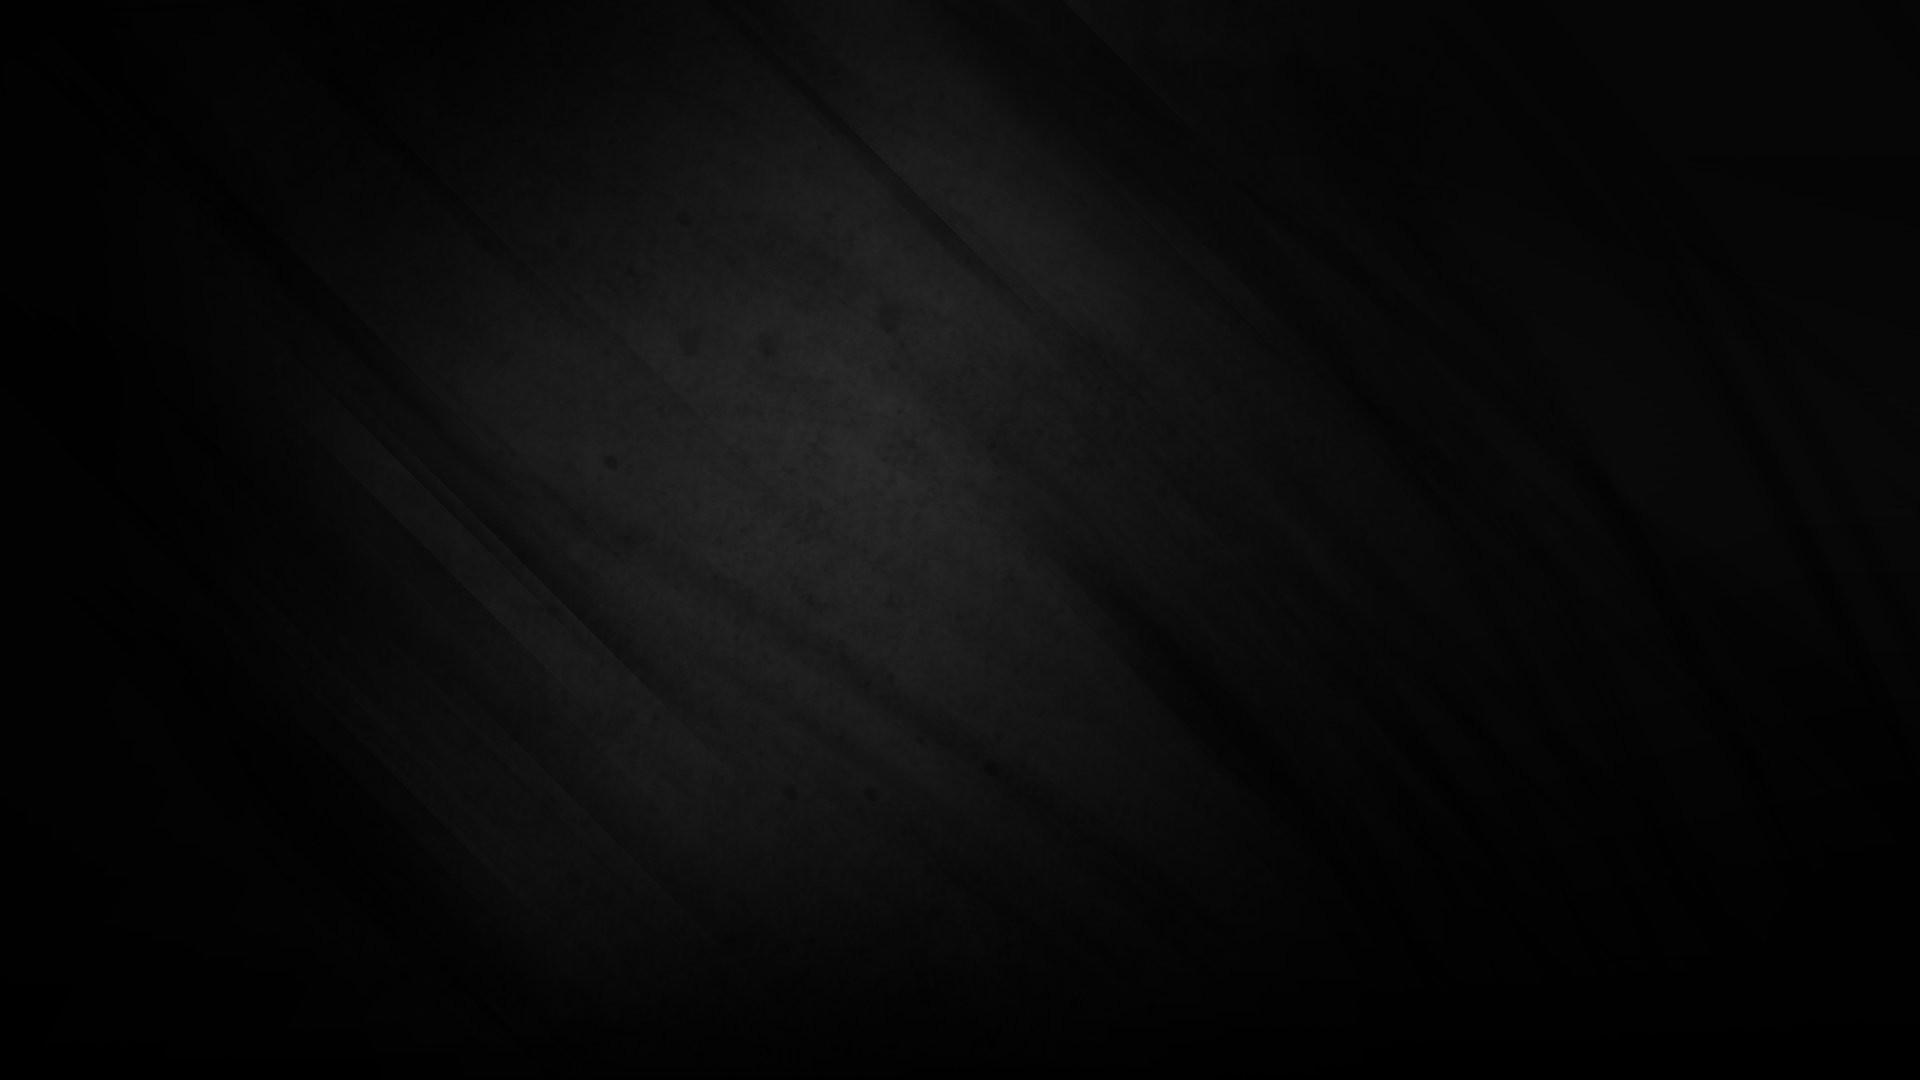 black wallpaper 1 black wallpaper 2 …